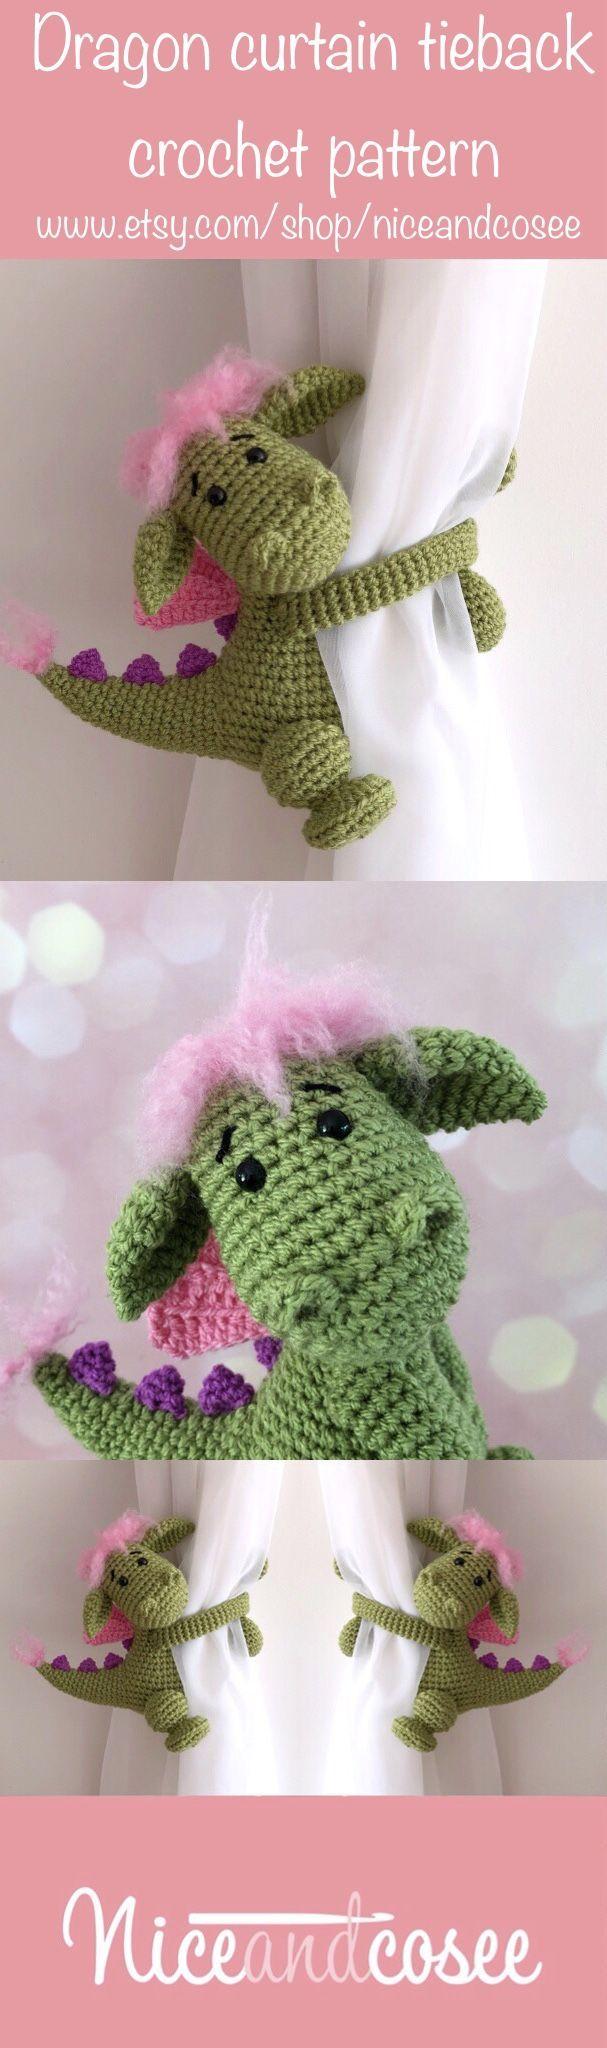 Dragon curtain tie back crochet PATTERN, tieback, left or right side crochet pattern PDF instant download amigurumi PATTERN #eyeshaveit